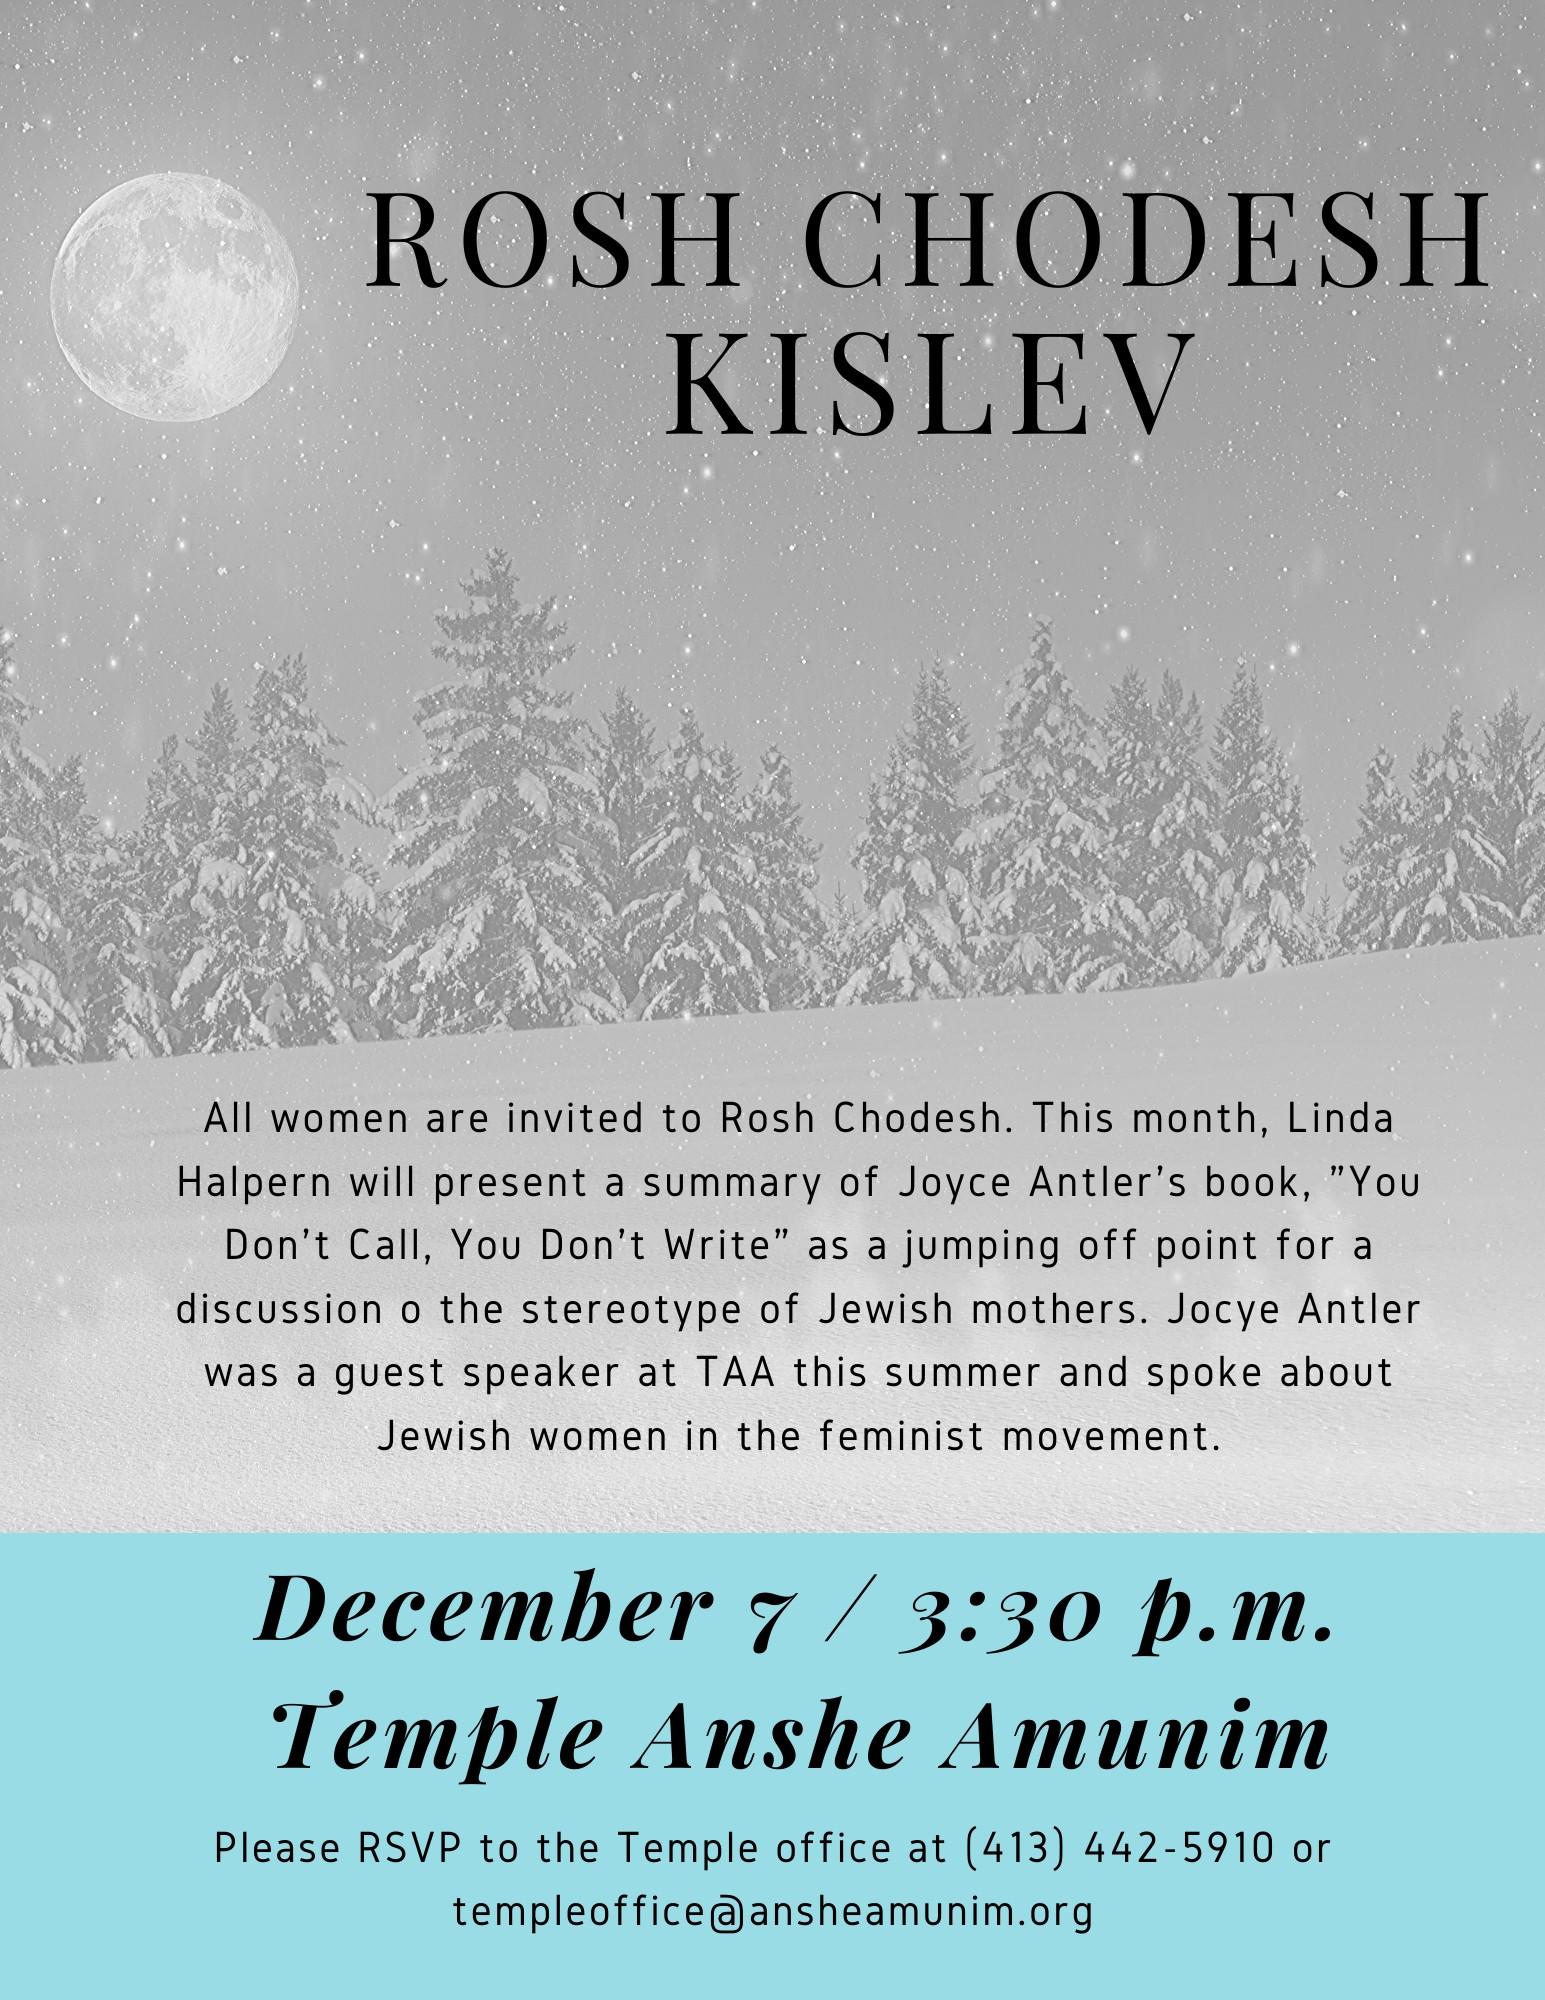 Banner Image for Rosh Chodesh Kislev